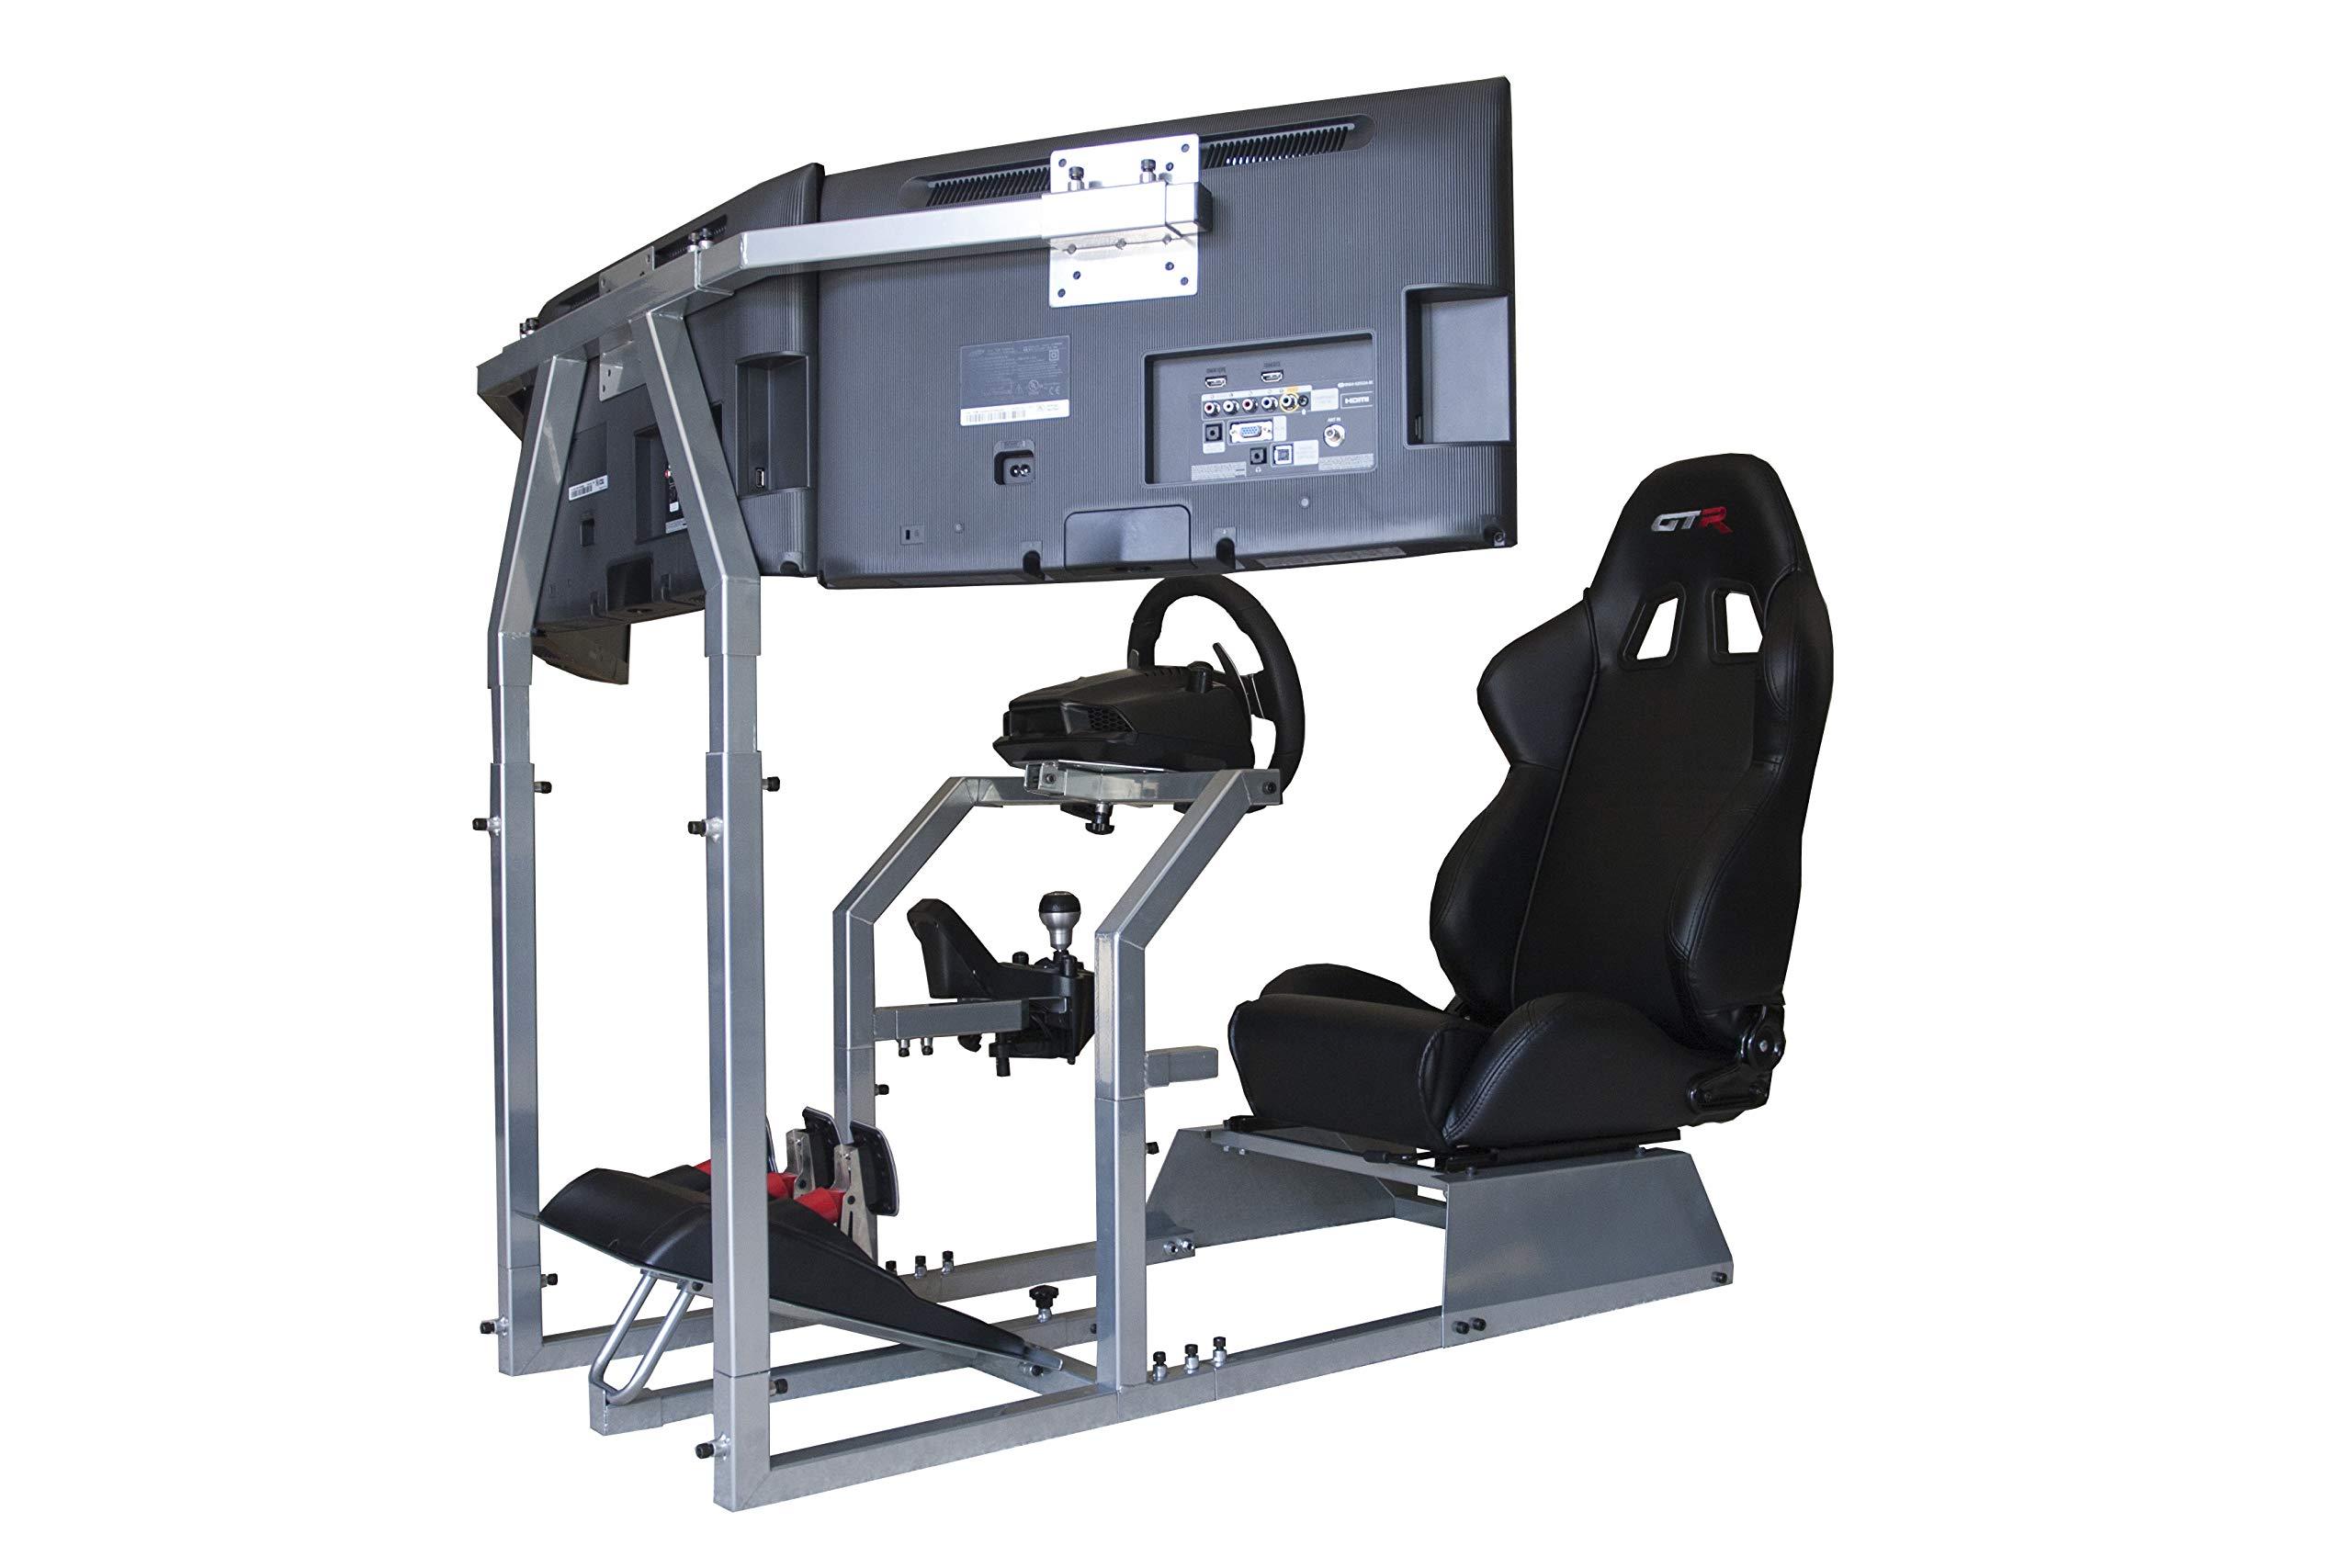 GTR Simulator - GTA-F Model Racing Simulator Triple or Single Monitor Stand with Adjustable Leatherette Seat, Racing Simulator Cockpit Gaming Chair Single Monitor Stand by GTR Simulator